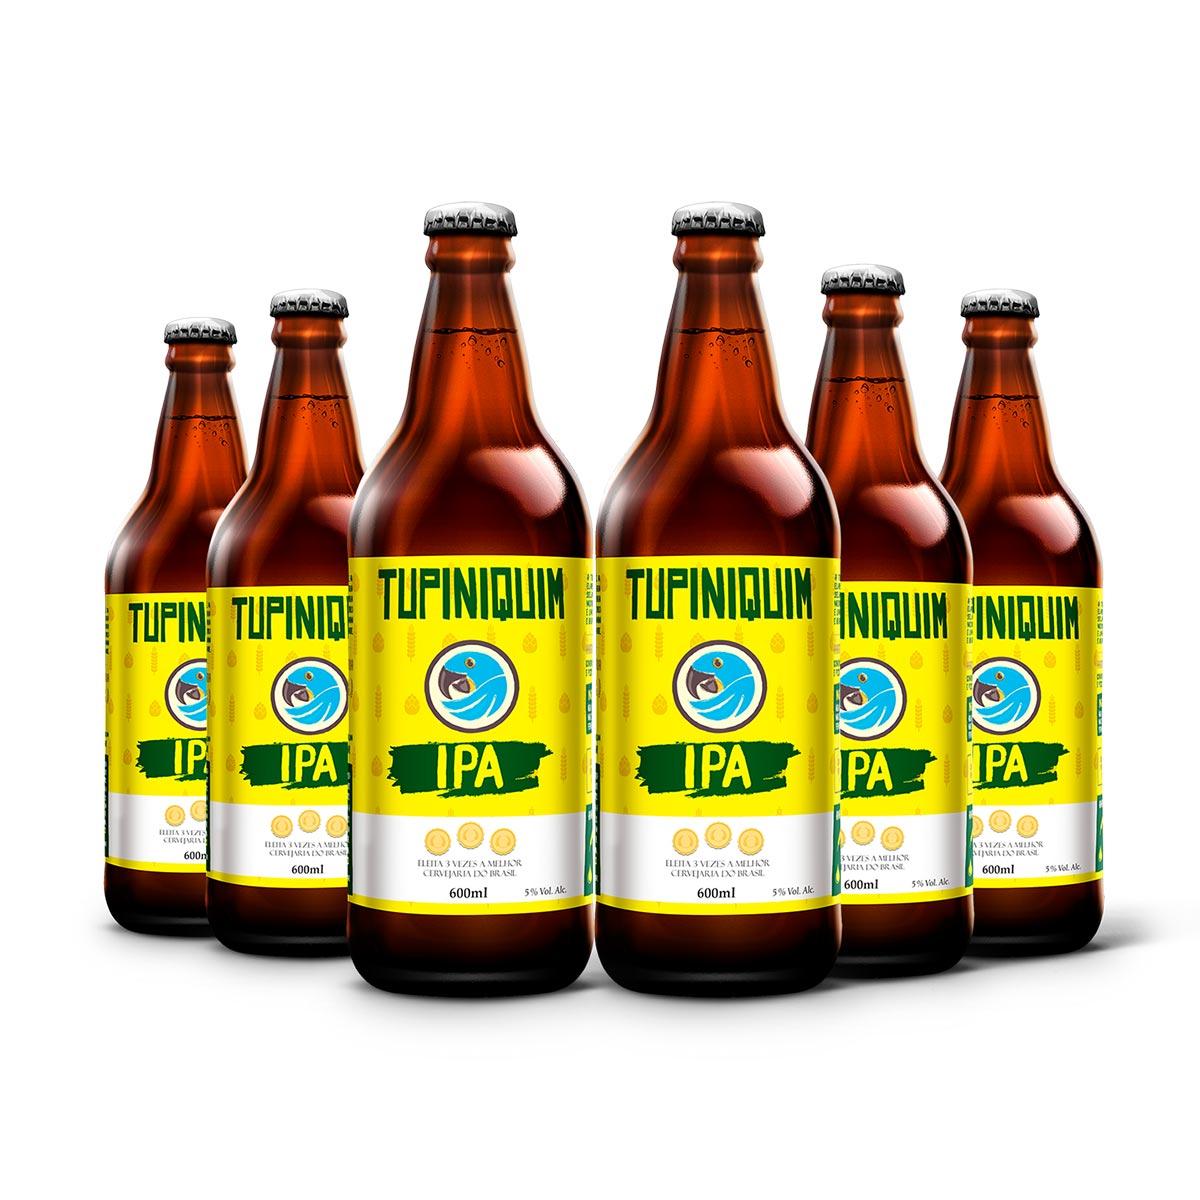 Pack Tupiniquim India Pale Ale IPA 6 cervejas 600ml